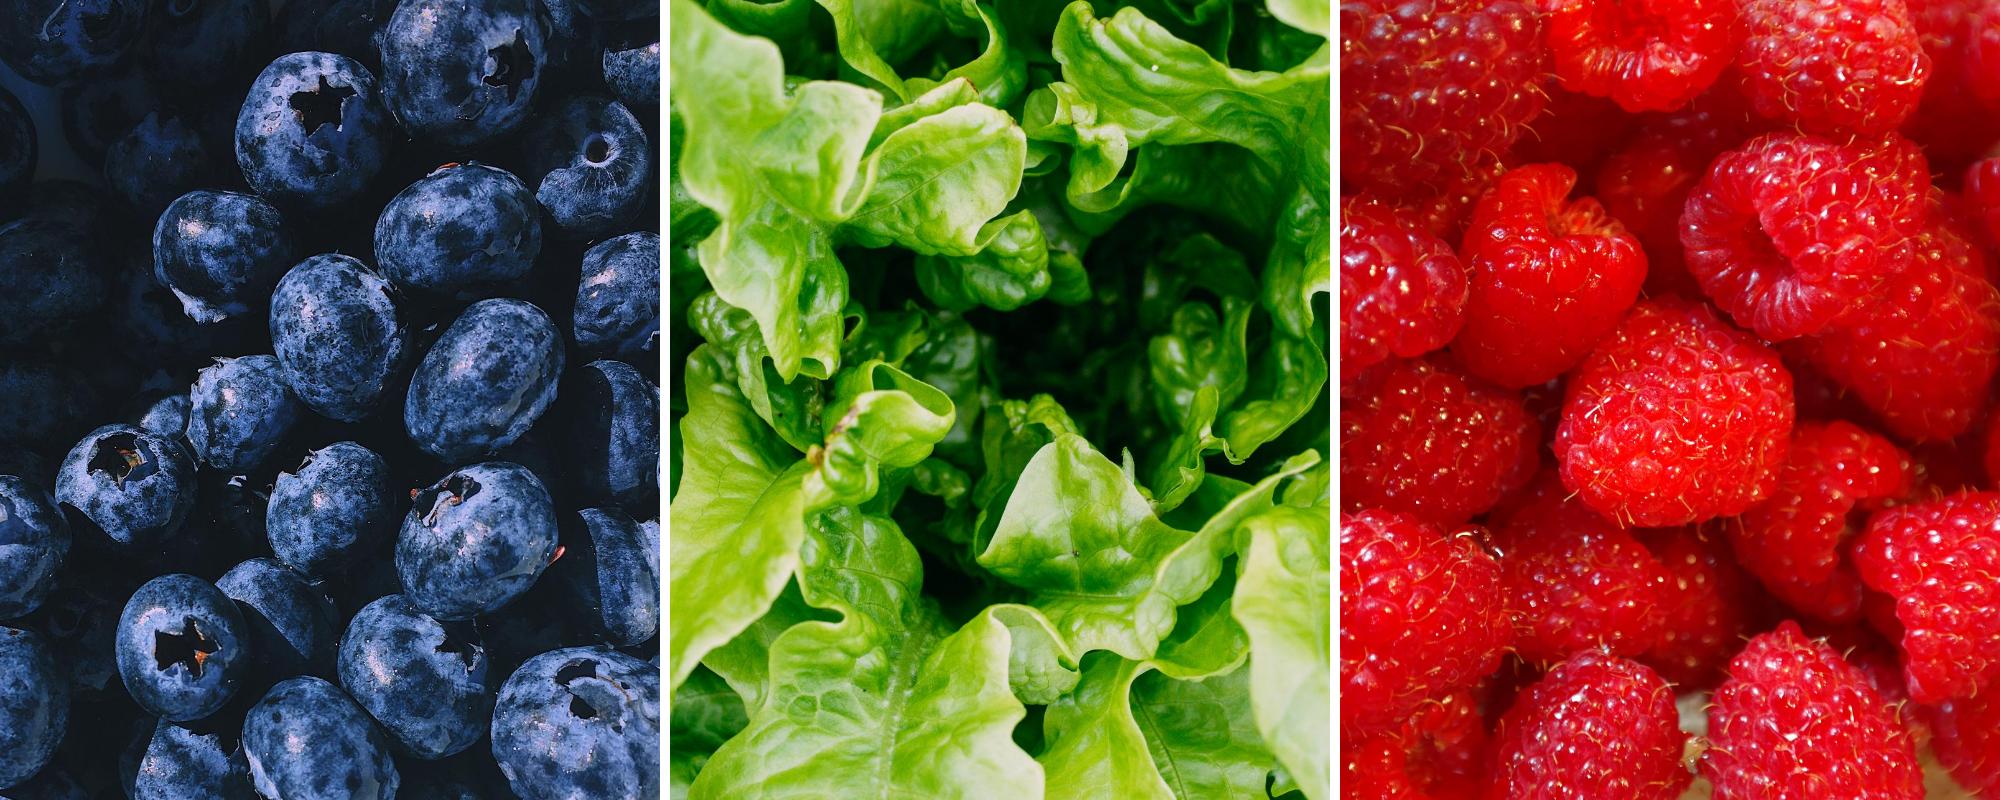 Fruits & Veggies Month - blueberries, lettuce, strawberries